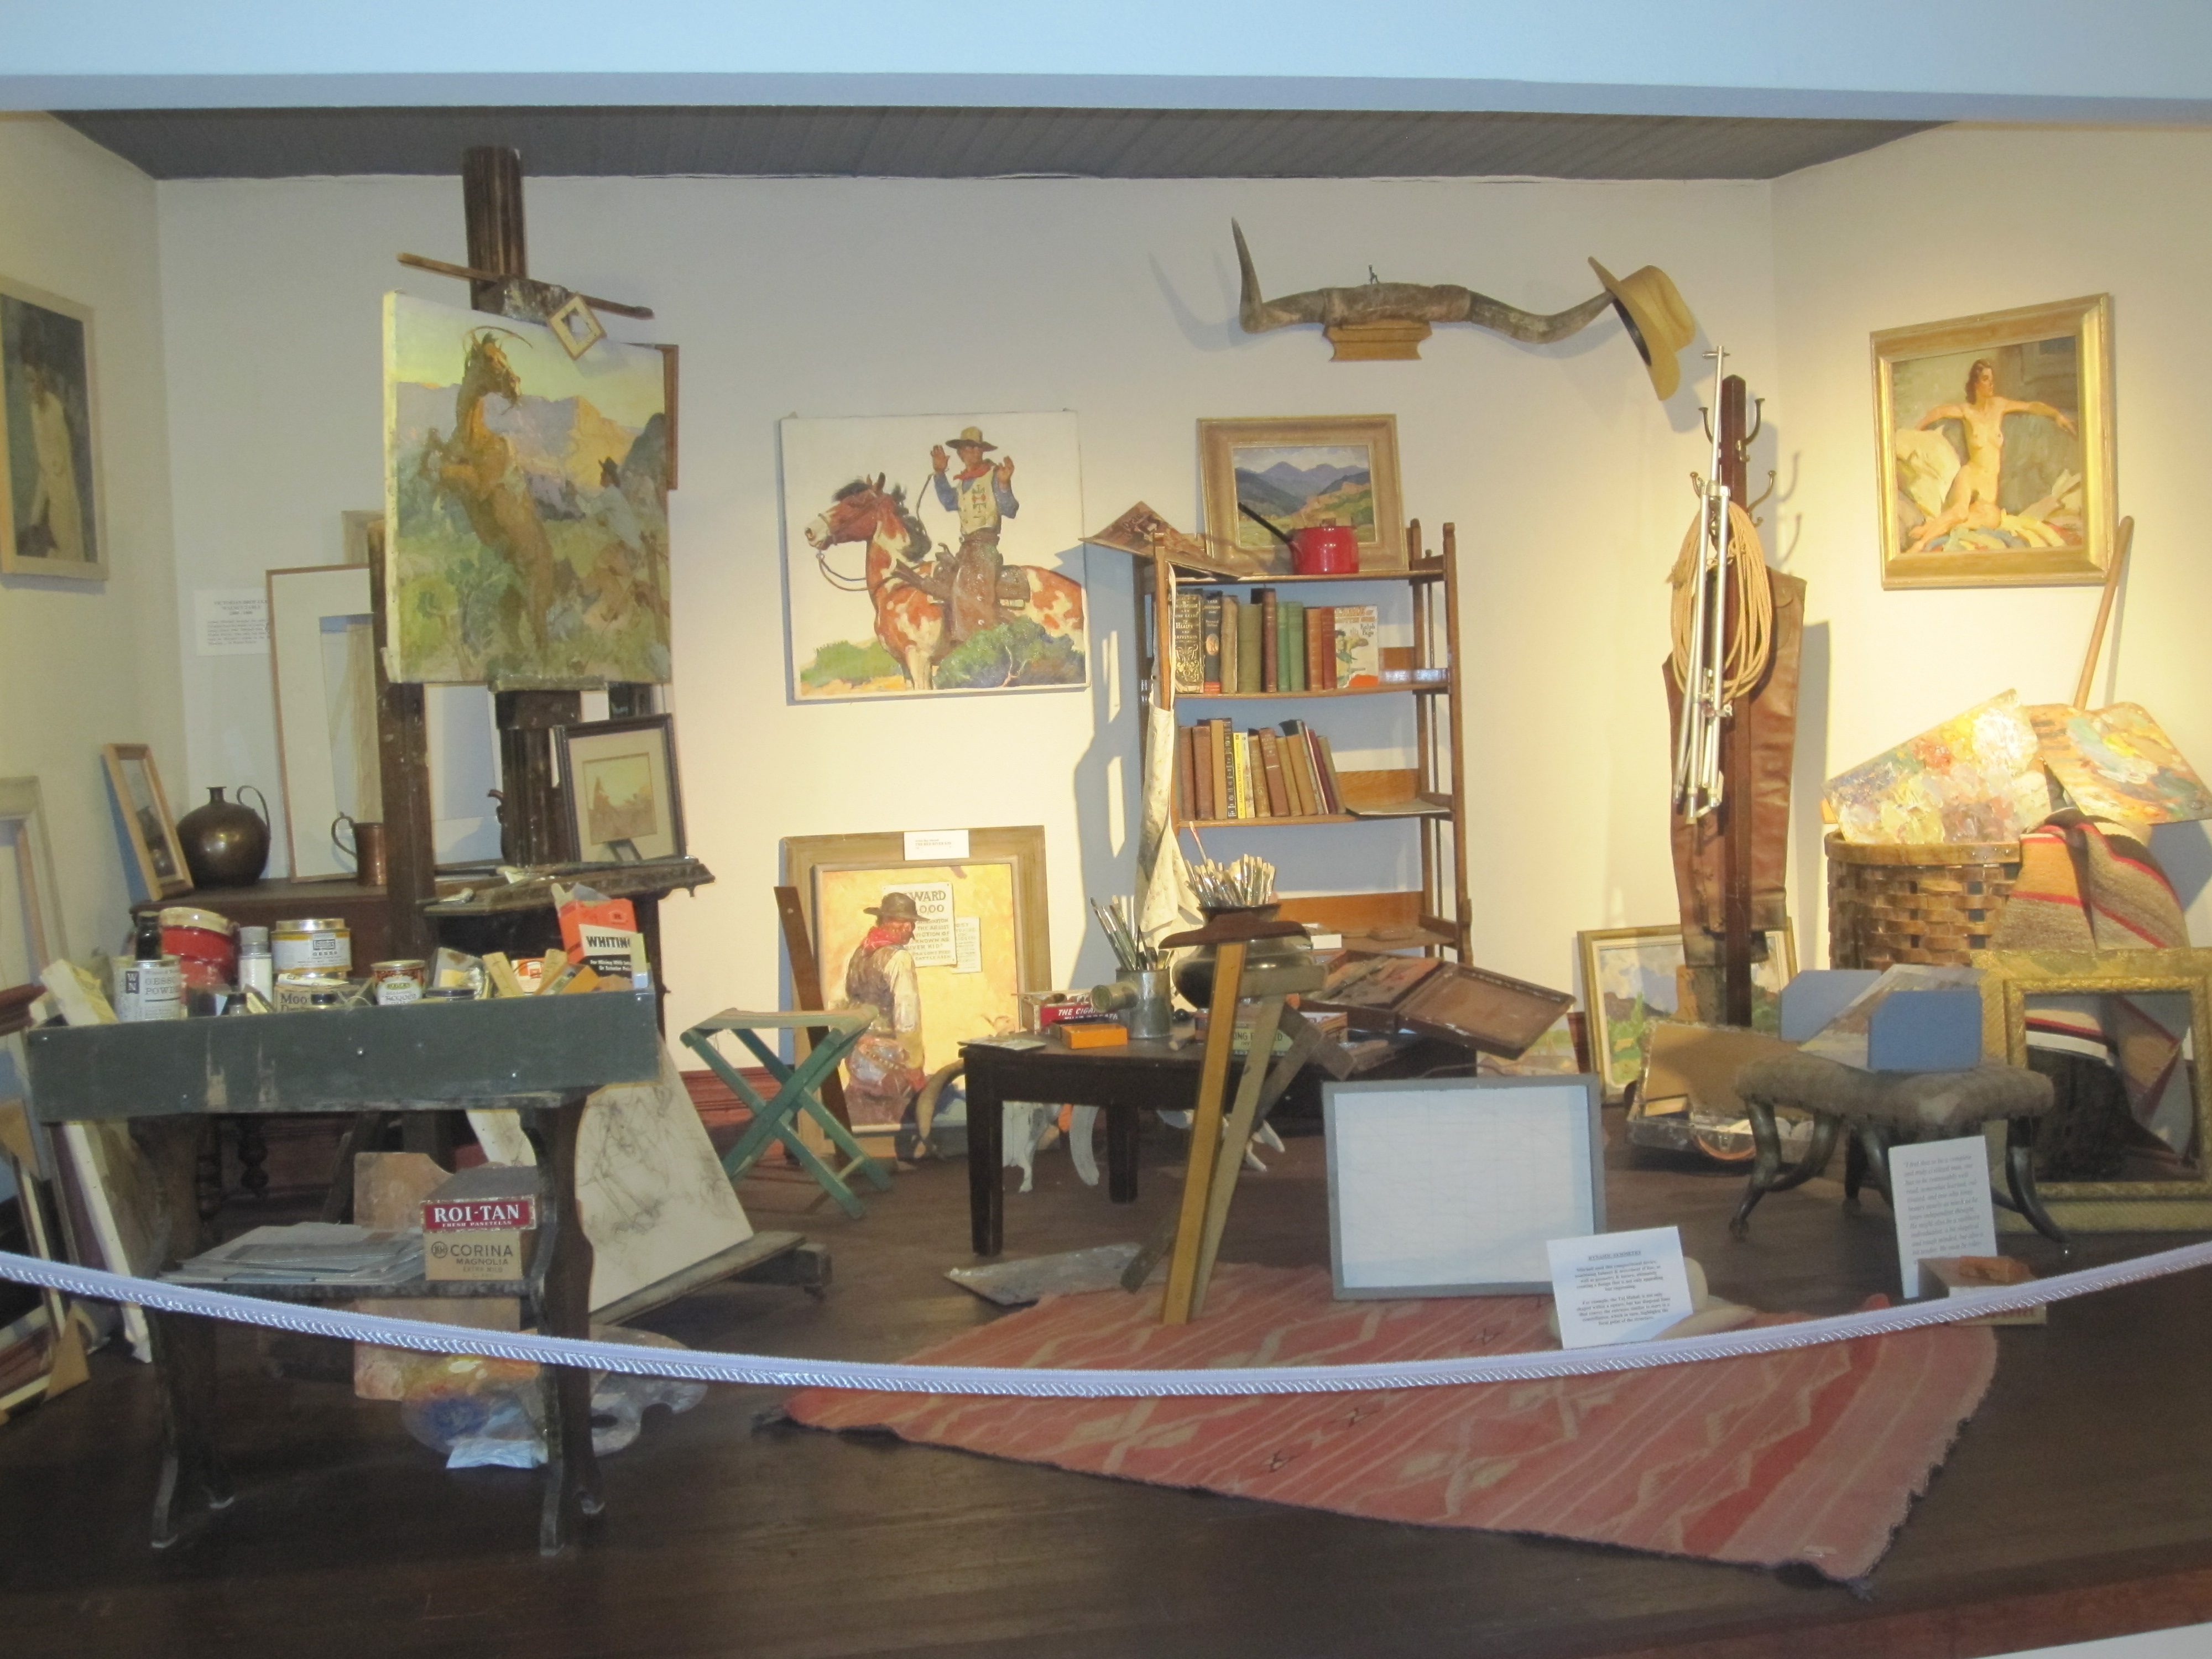 Artist Studio Room Design Ideas